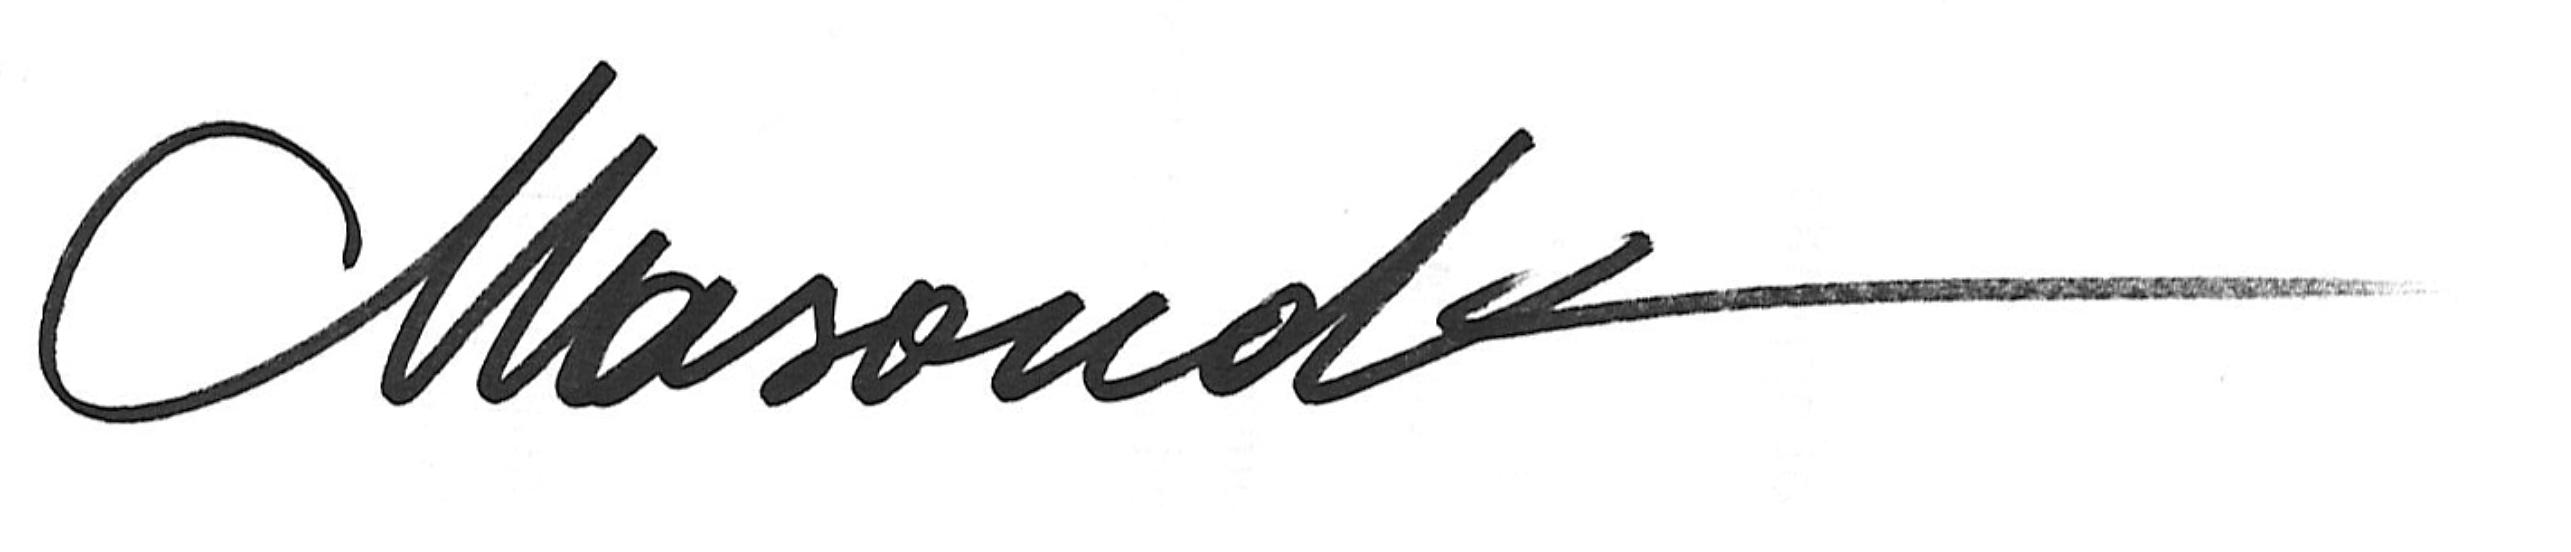 Masoud Kamali's Signature